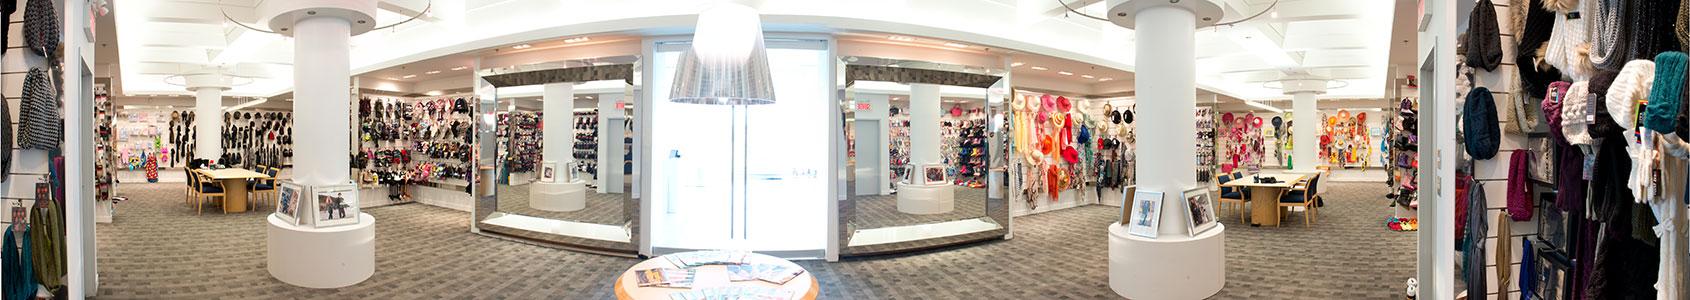 showroom_panorama